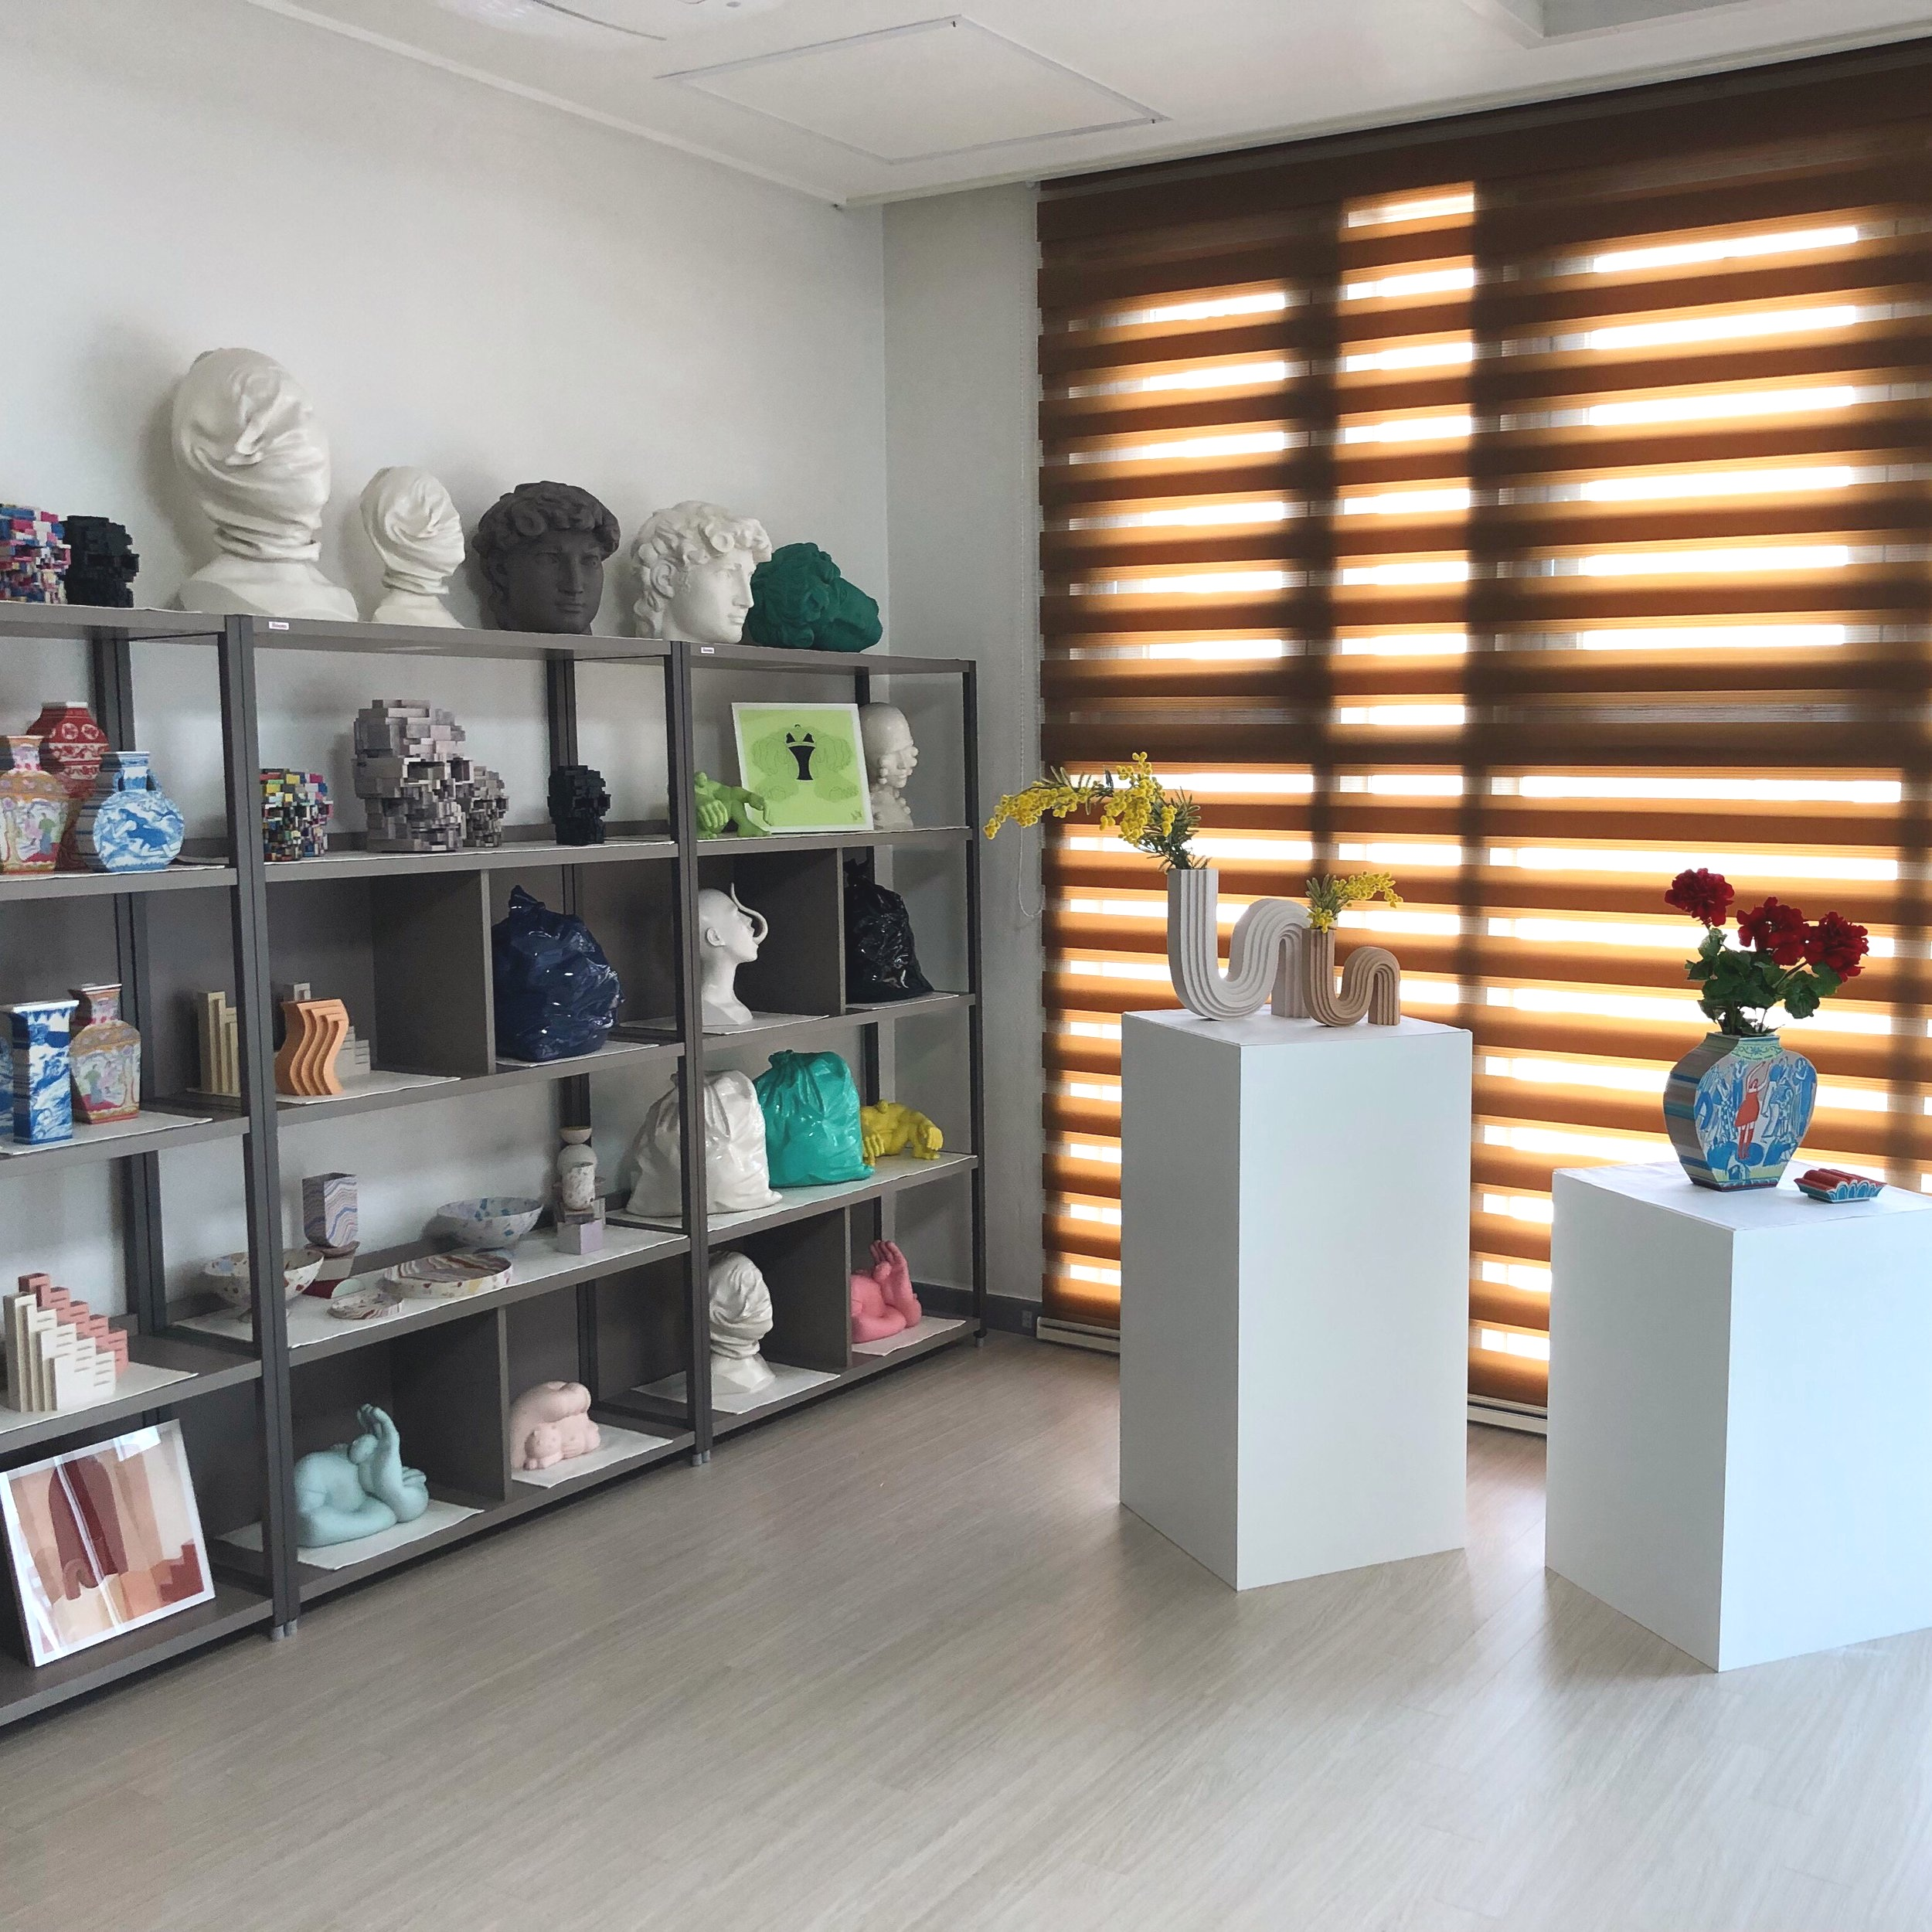 Showroom in Seoul, South Korea